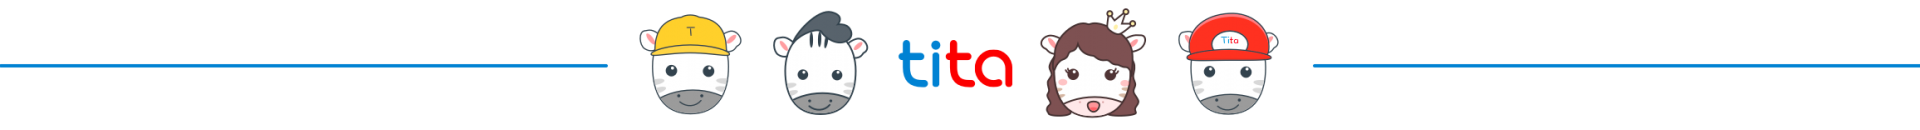 Tita | 餐饮企业结合Tita协同管理平台建立标准化运营